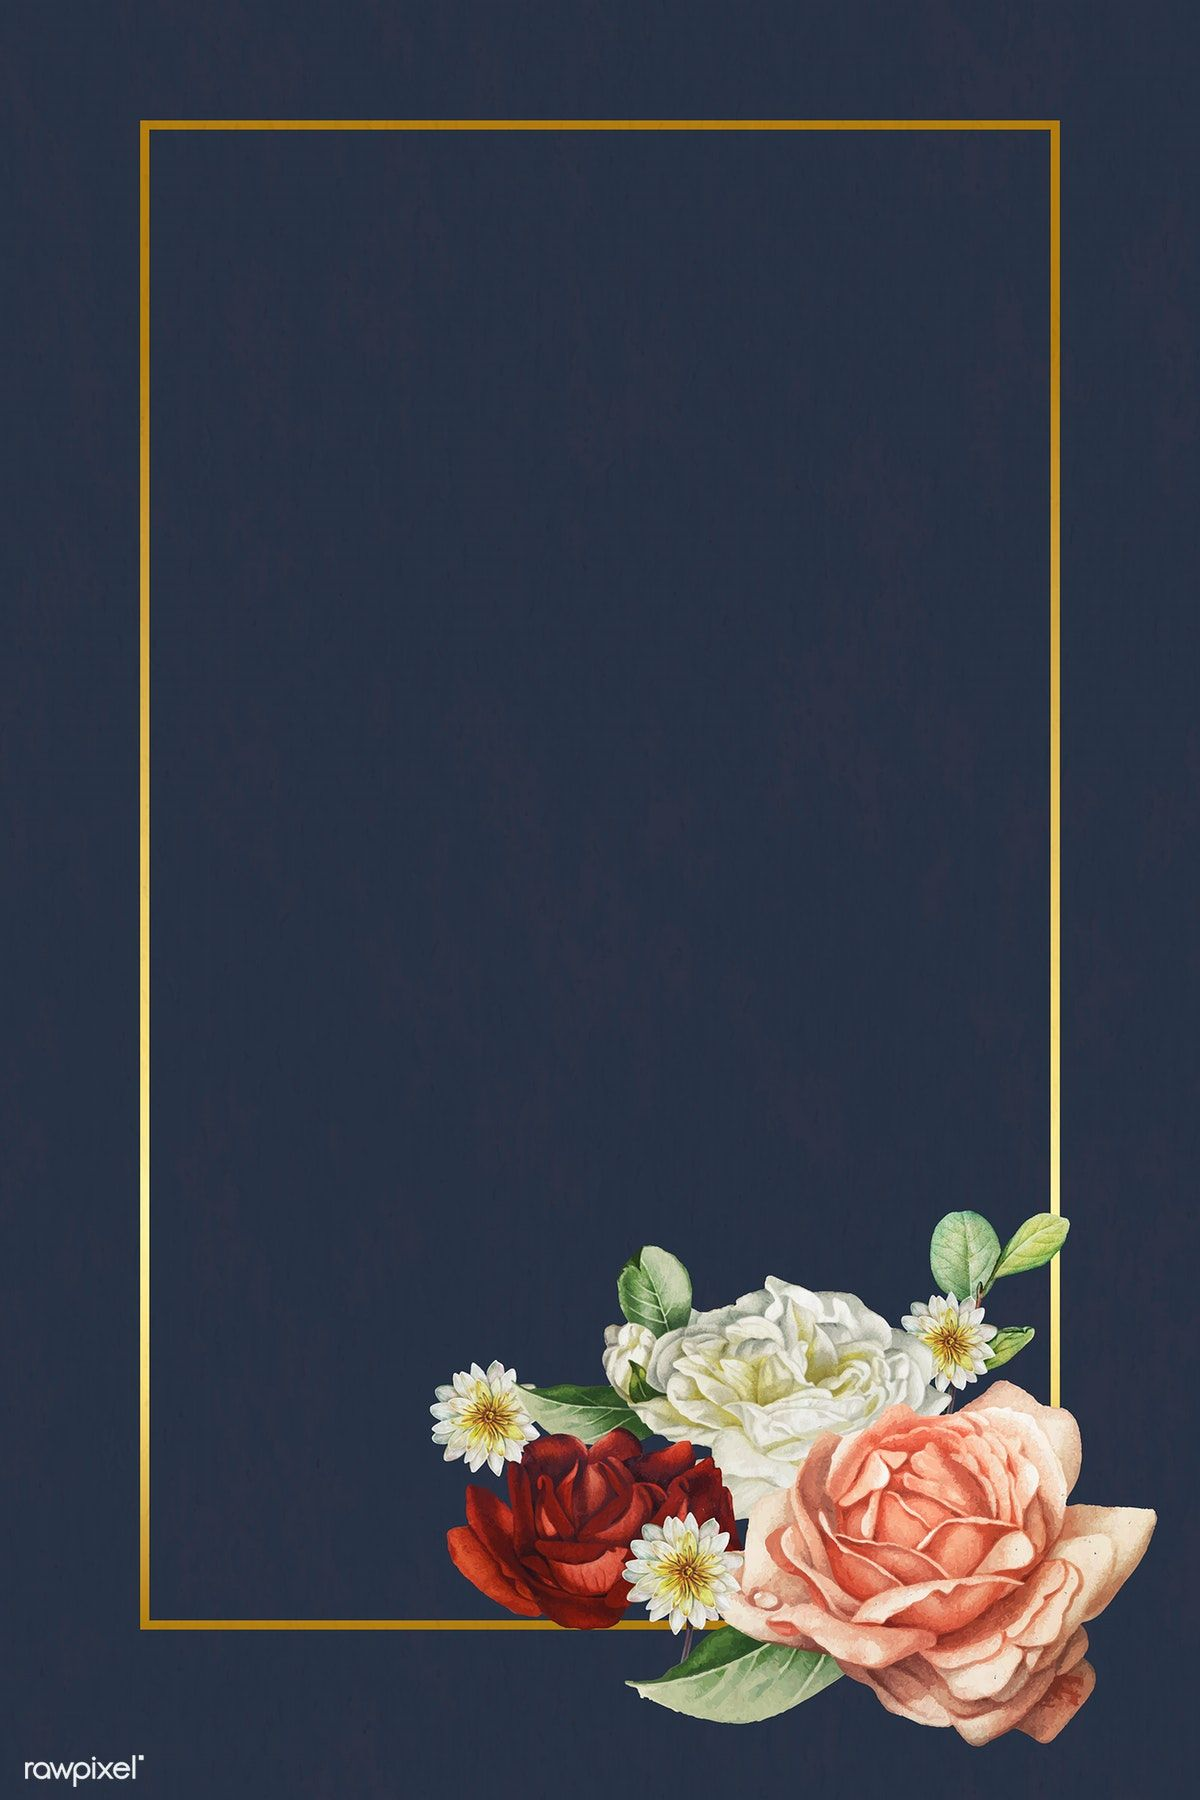 Download Premium Vector Of Floral Gold Frame On Blue Background